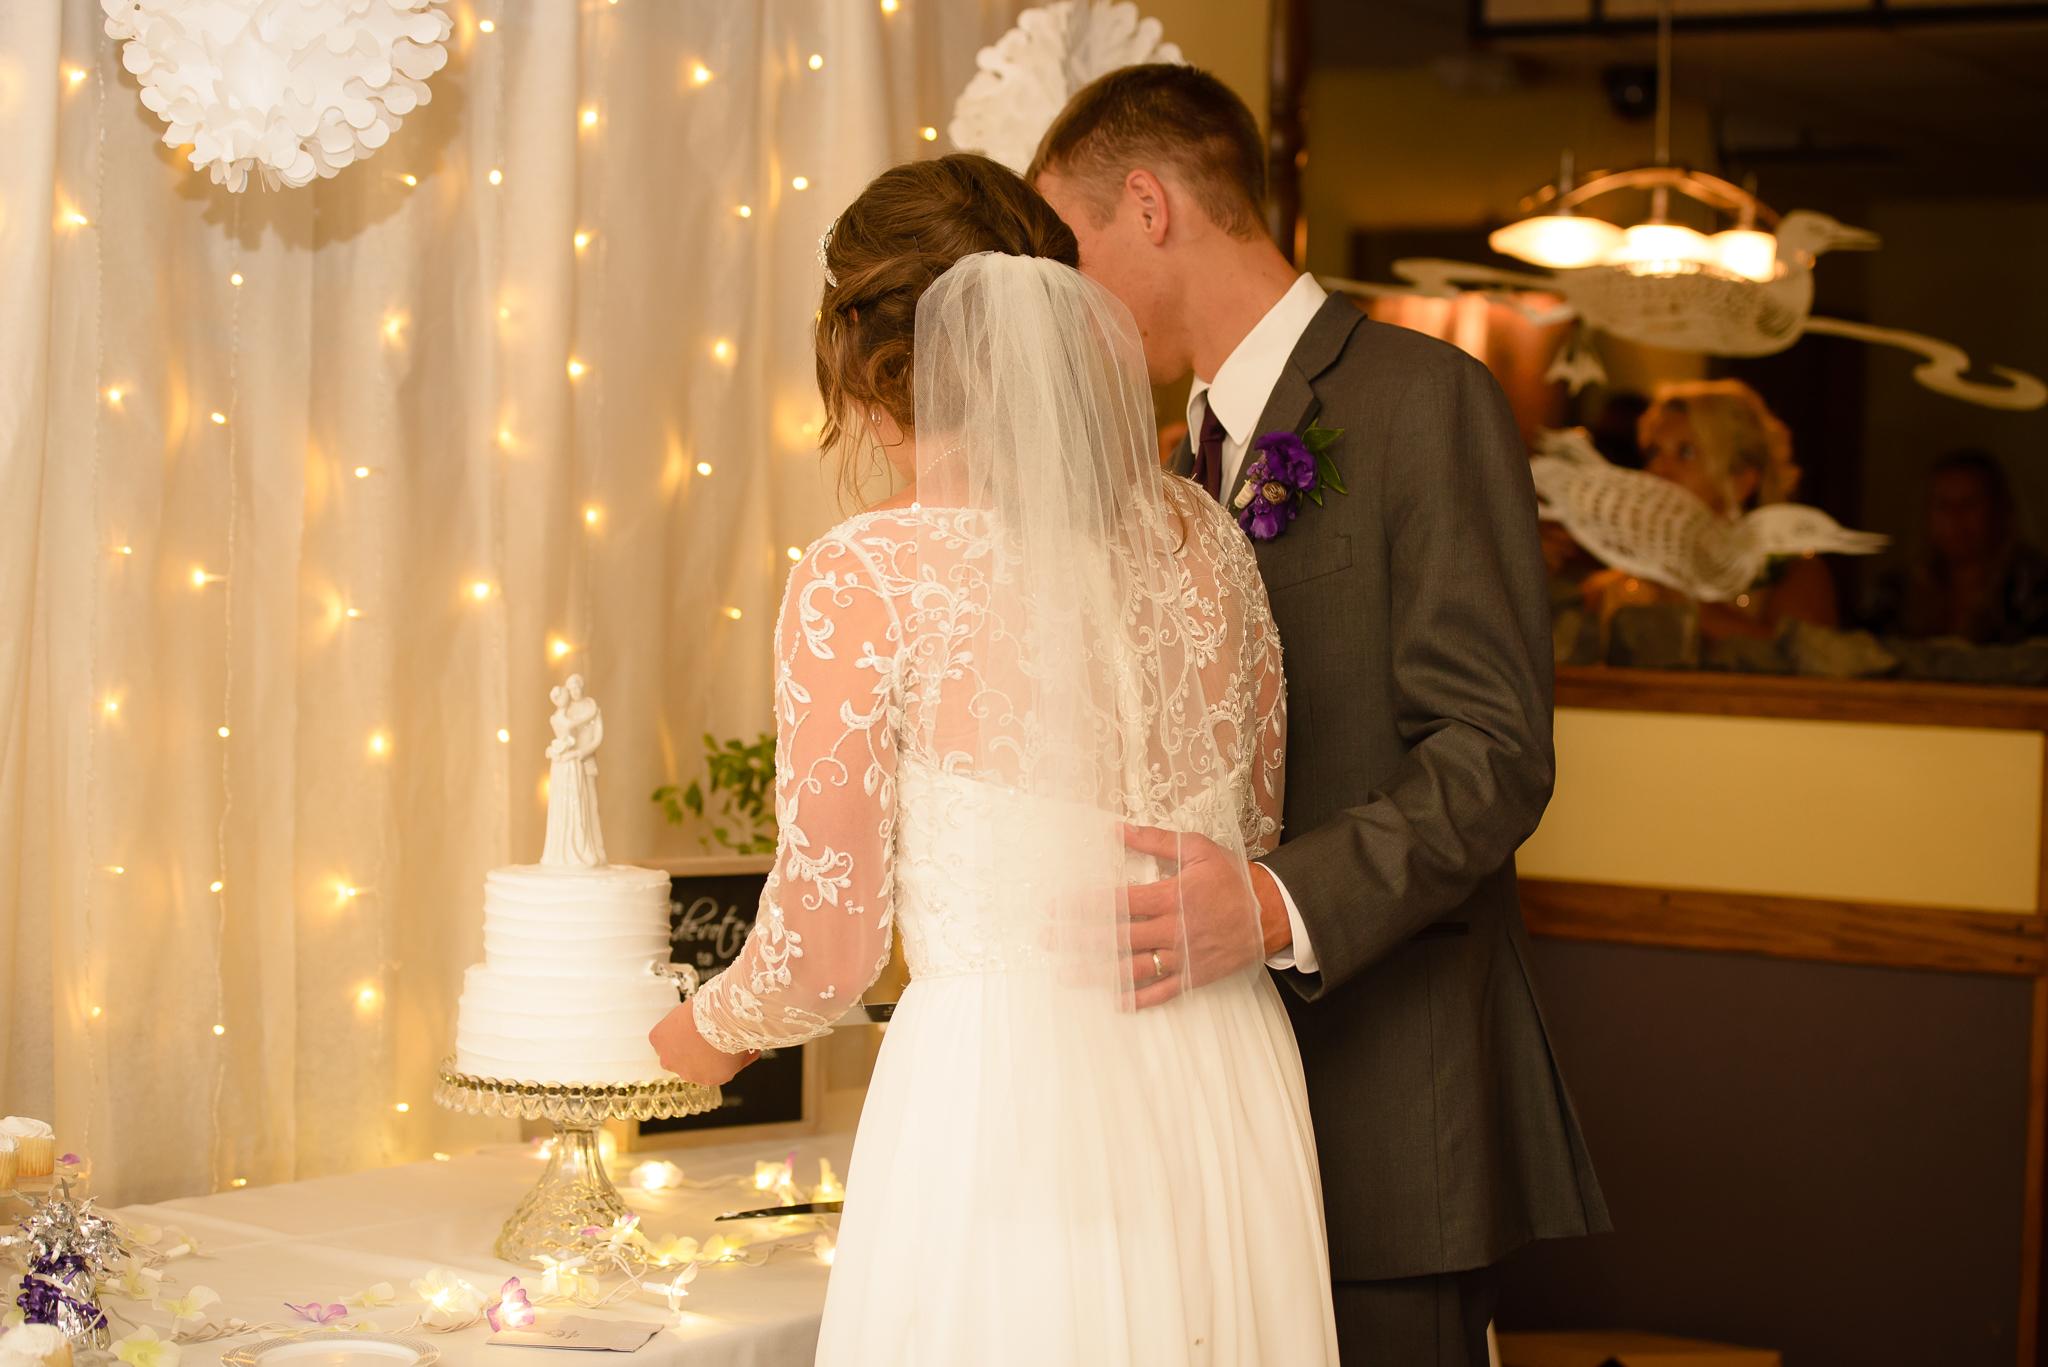 41-ashland washburn wedding photographyDSC_5813.jpg